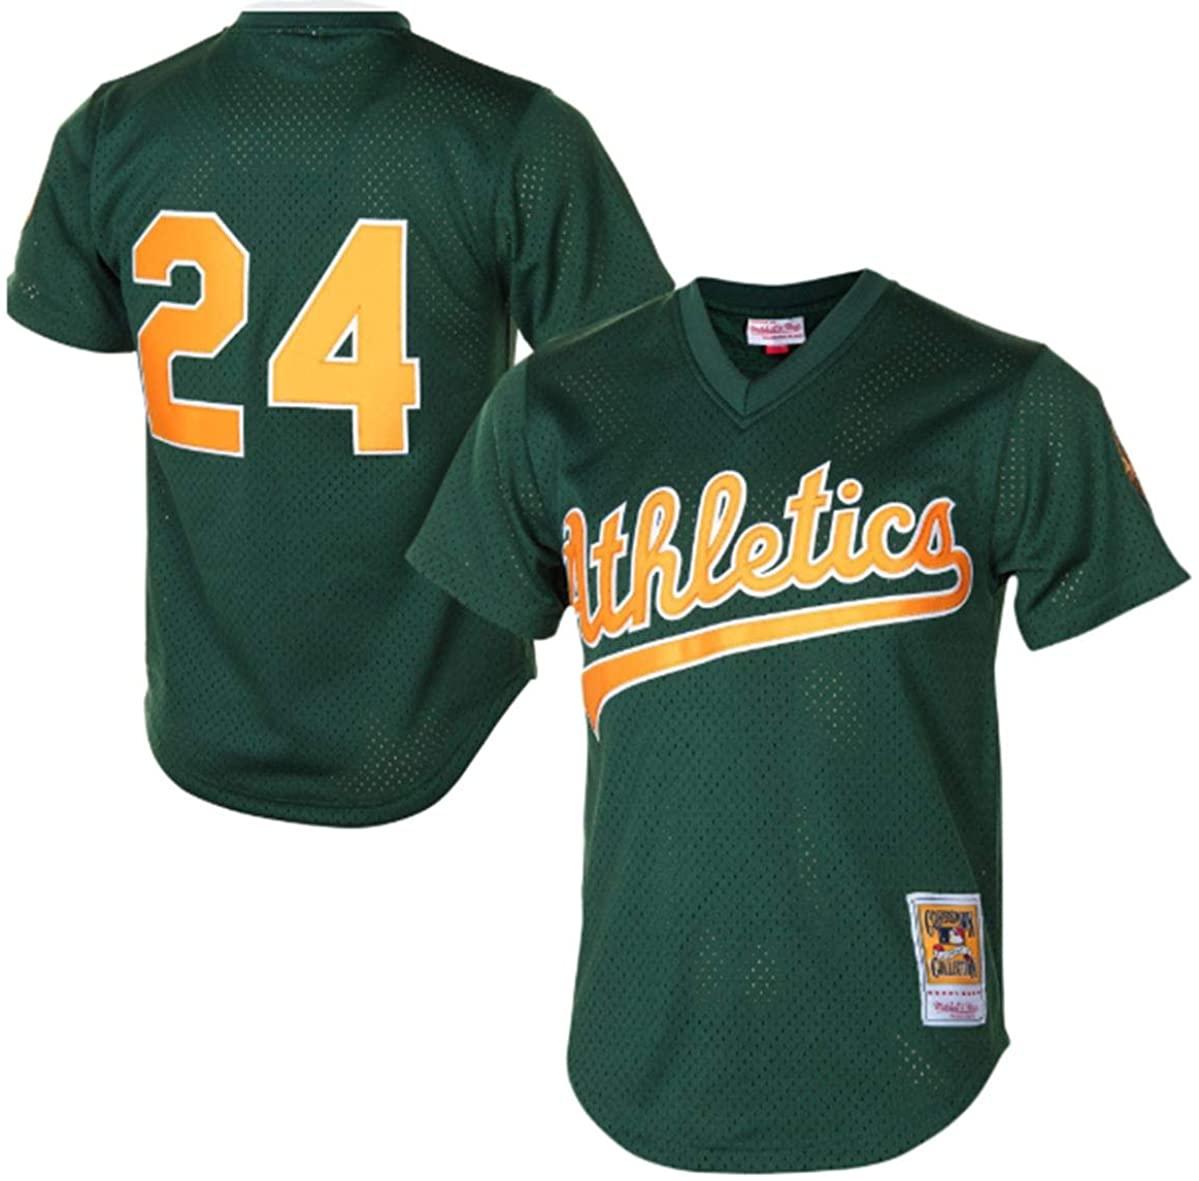 Rickey Henderson Oakland Athletics 1998 Cooperstown Mesh Batting Practice Jersey